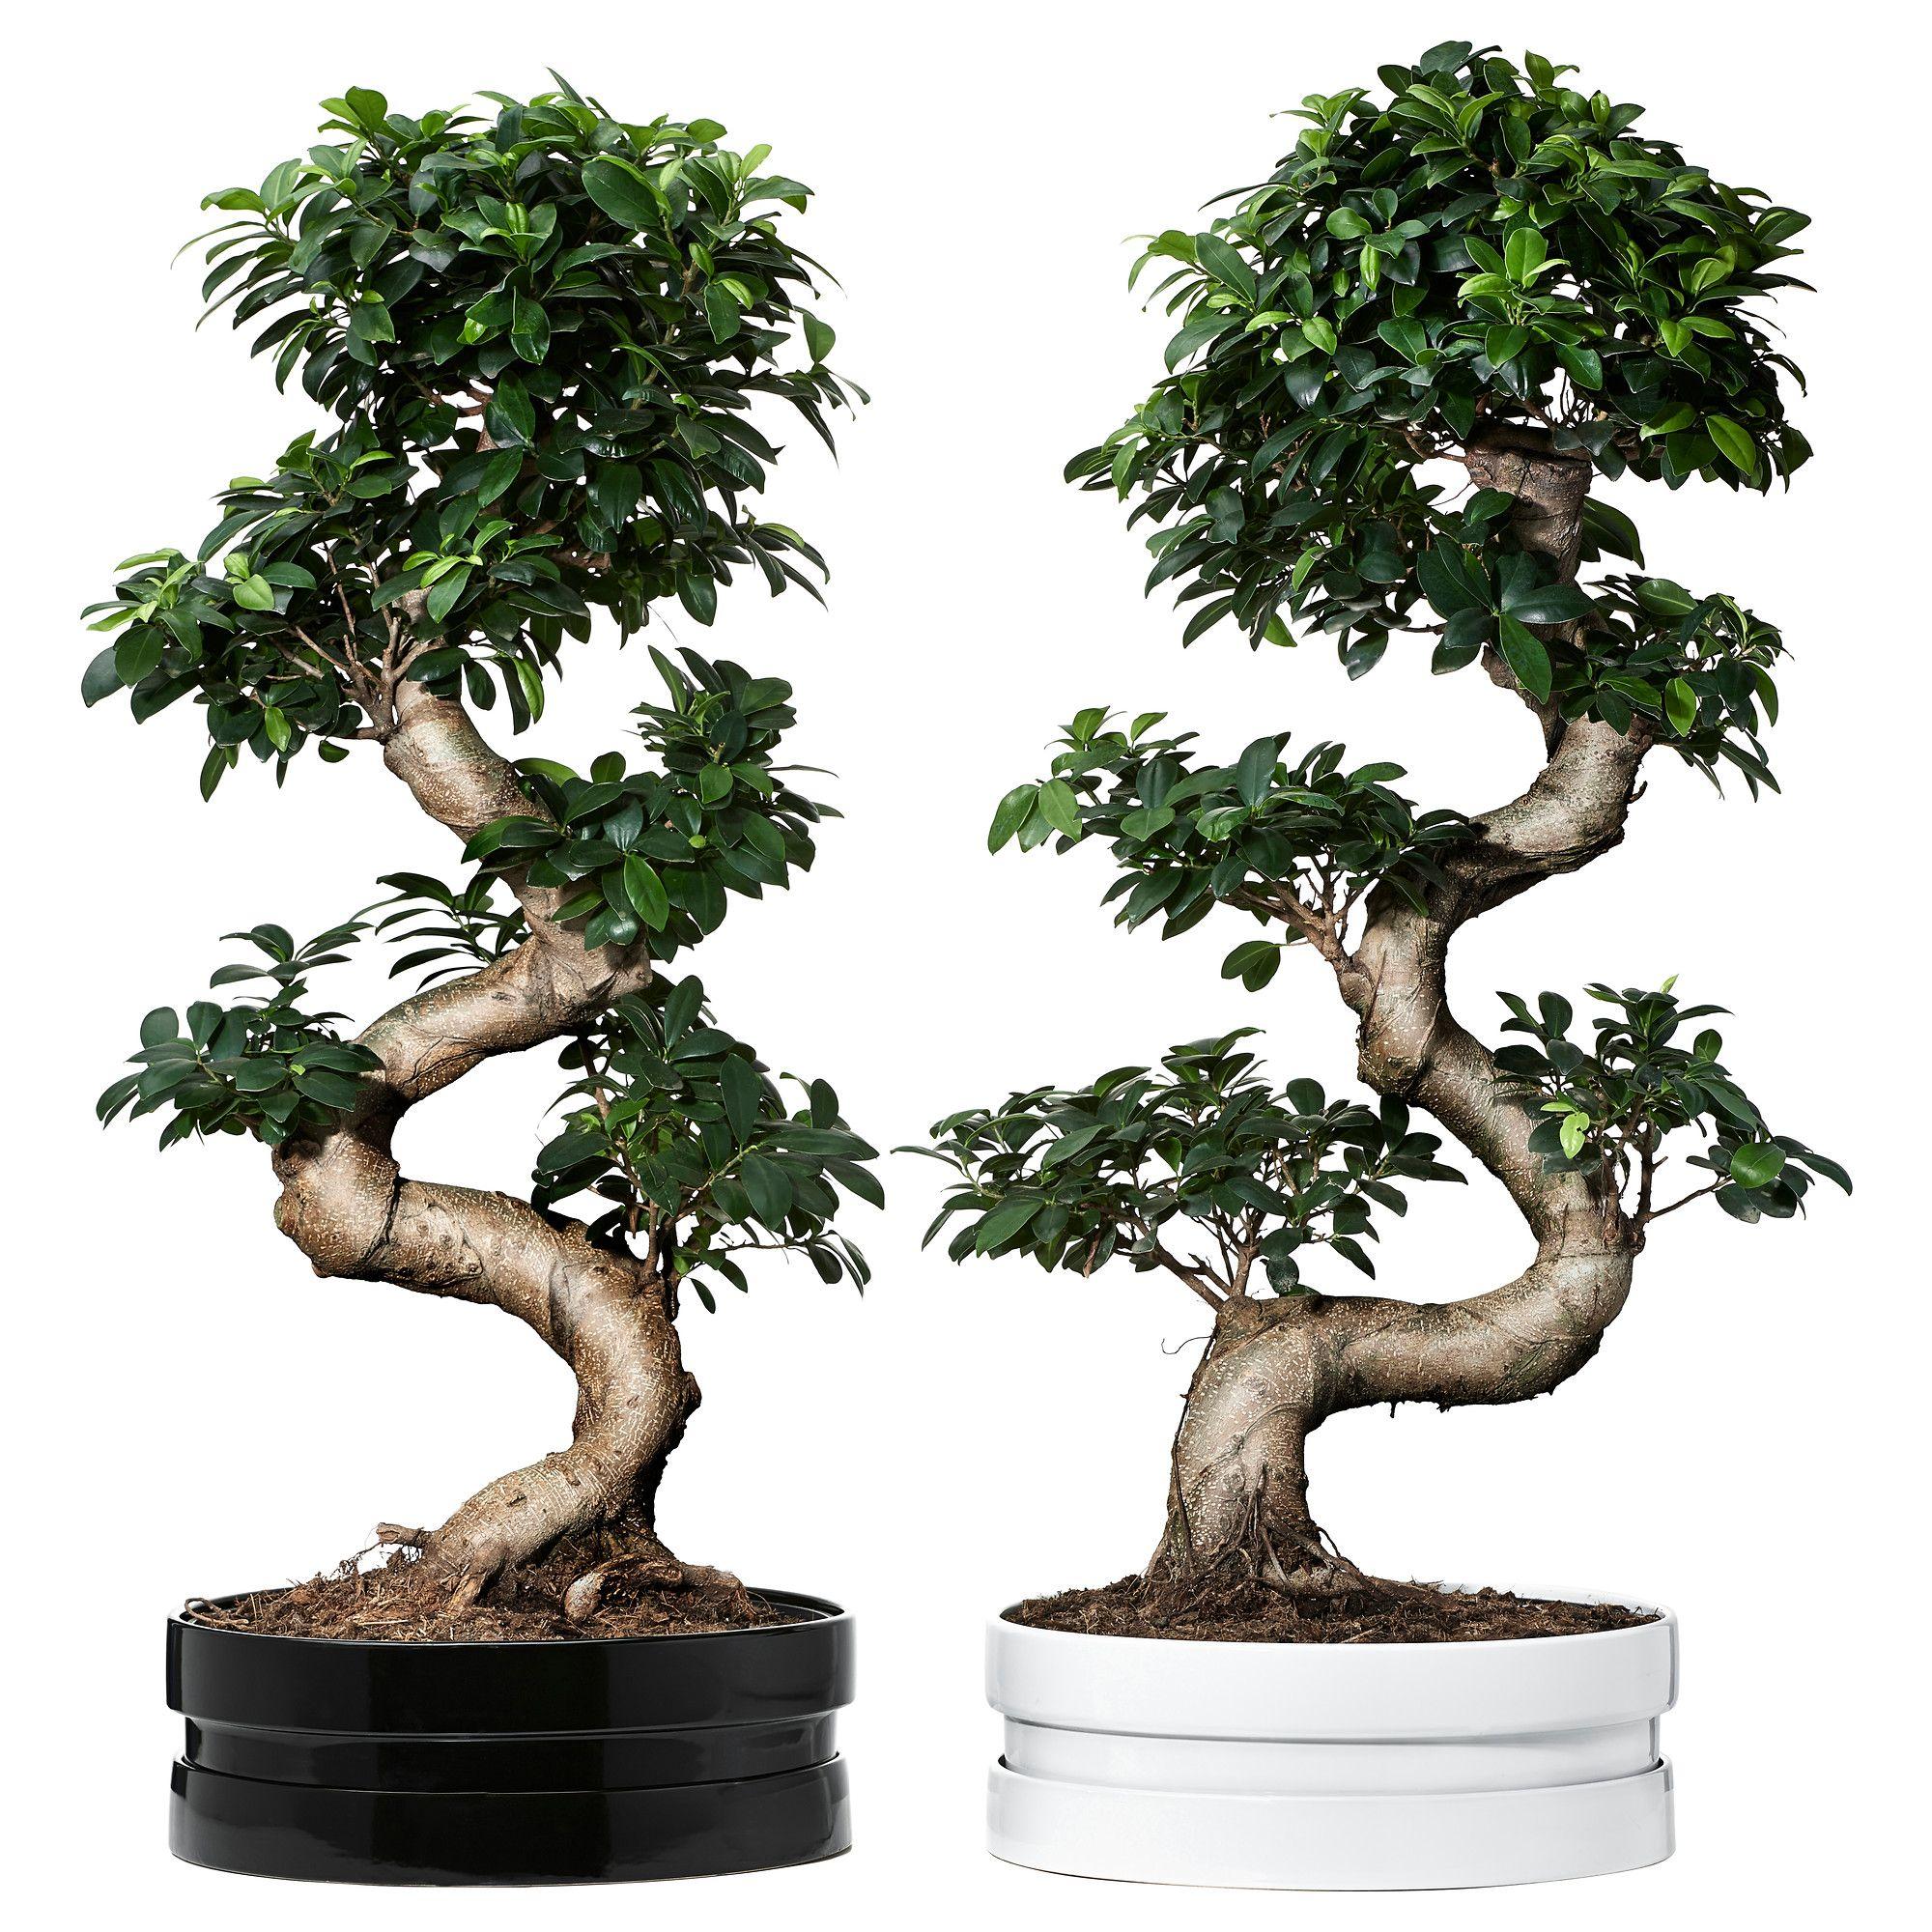 ficus microcarpa ginseng rastlina v kvetin i bonsaj r zne farby ficus met and bonsai. Black Bedroom Furniture Sets. Home Design Ideas